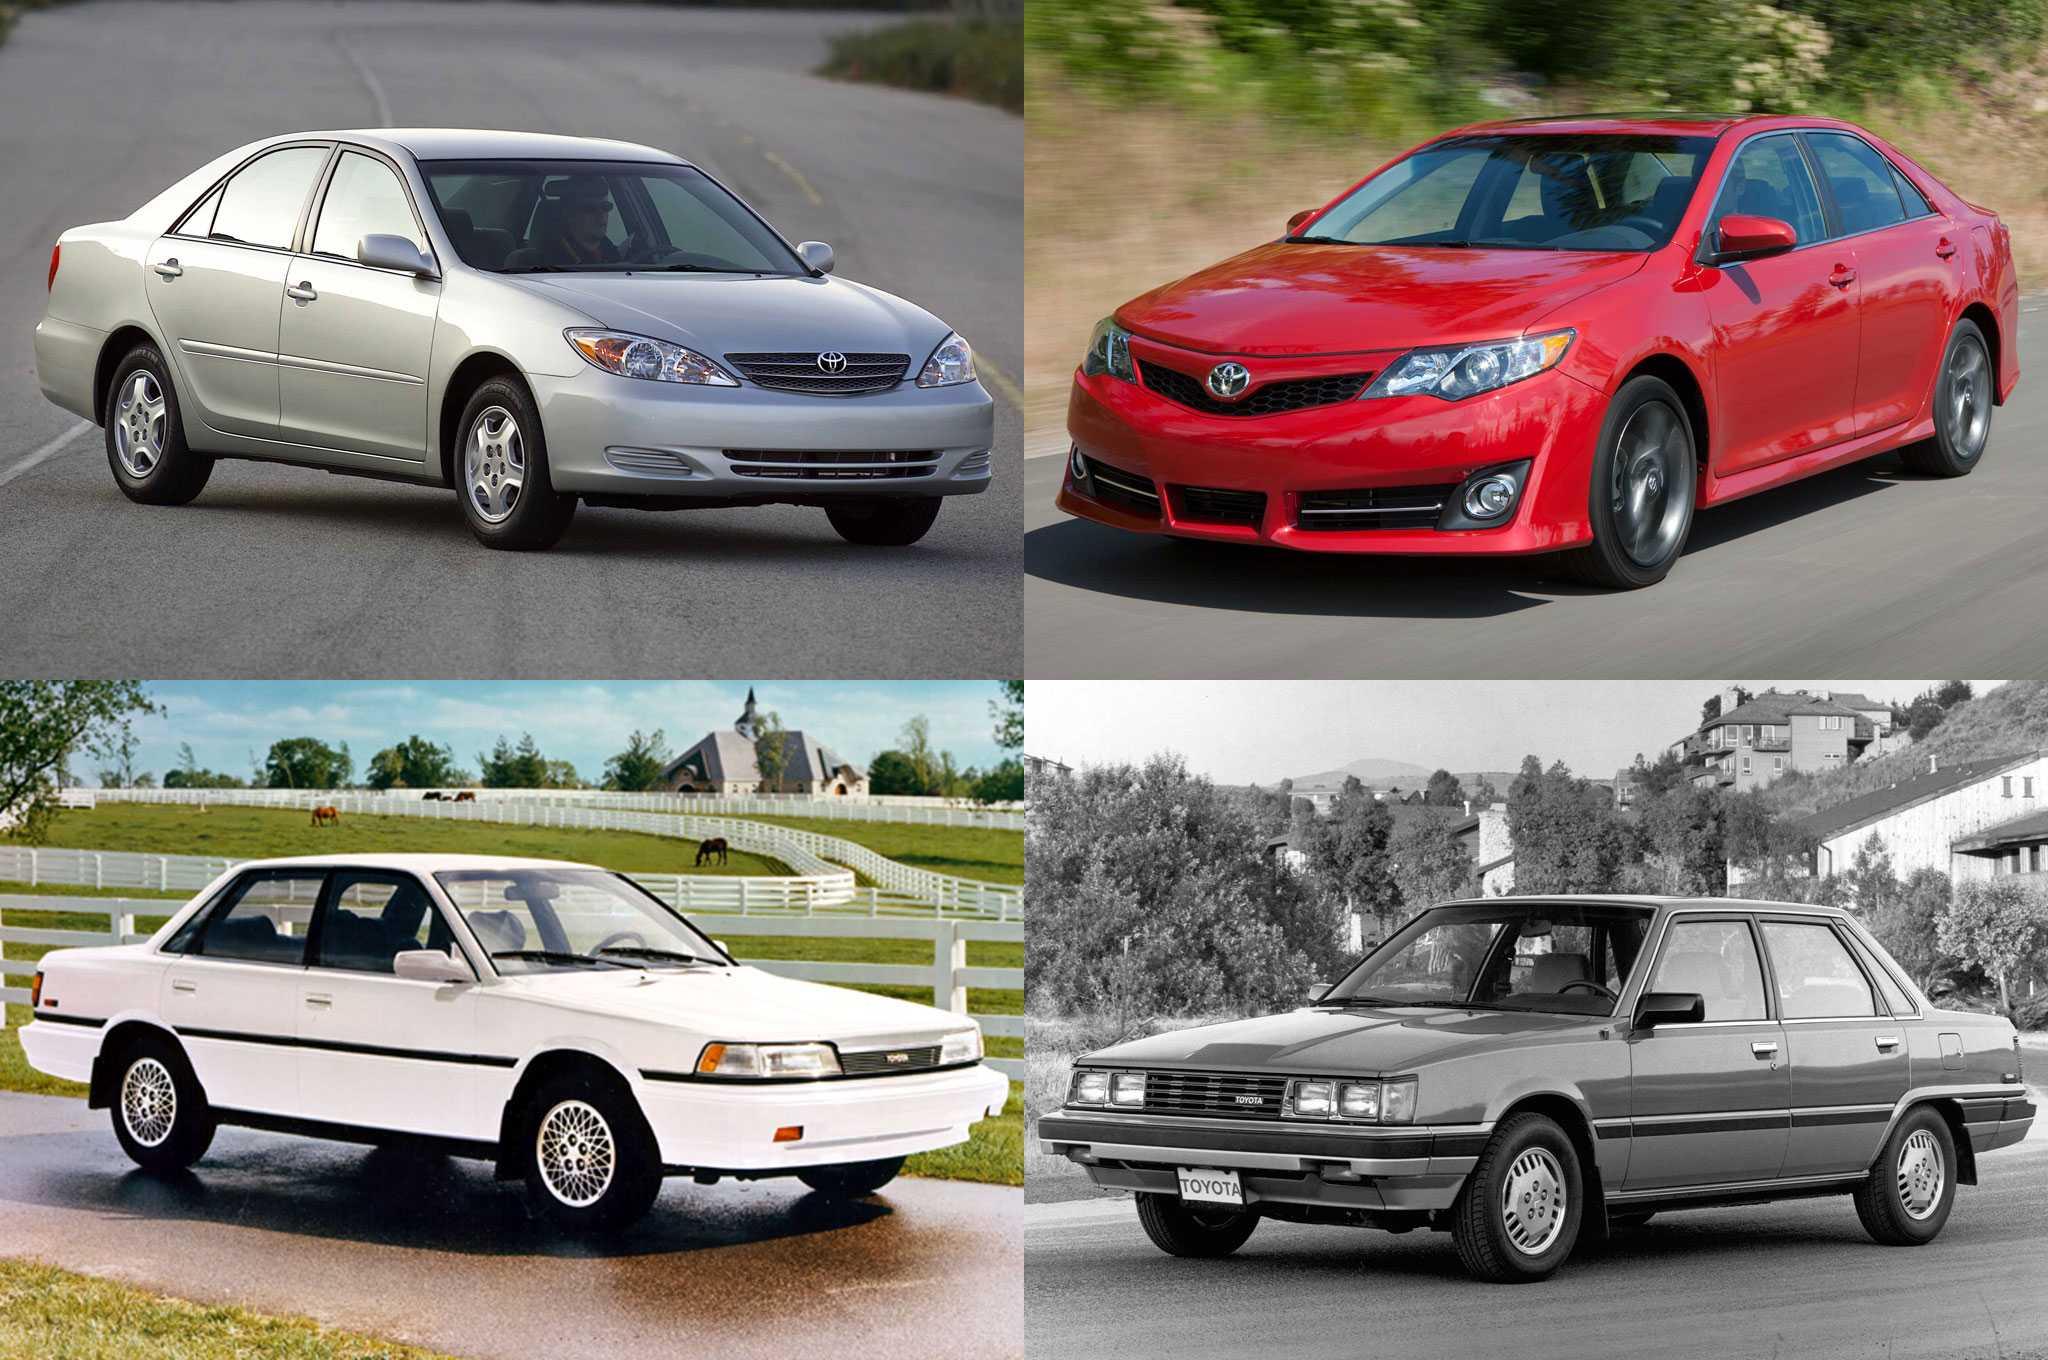 Камри какой класс автомобиля: бизнес (е класс)